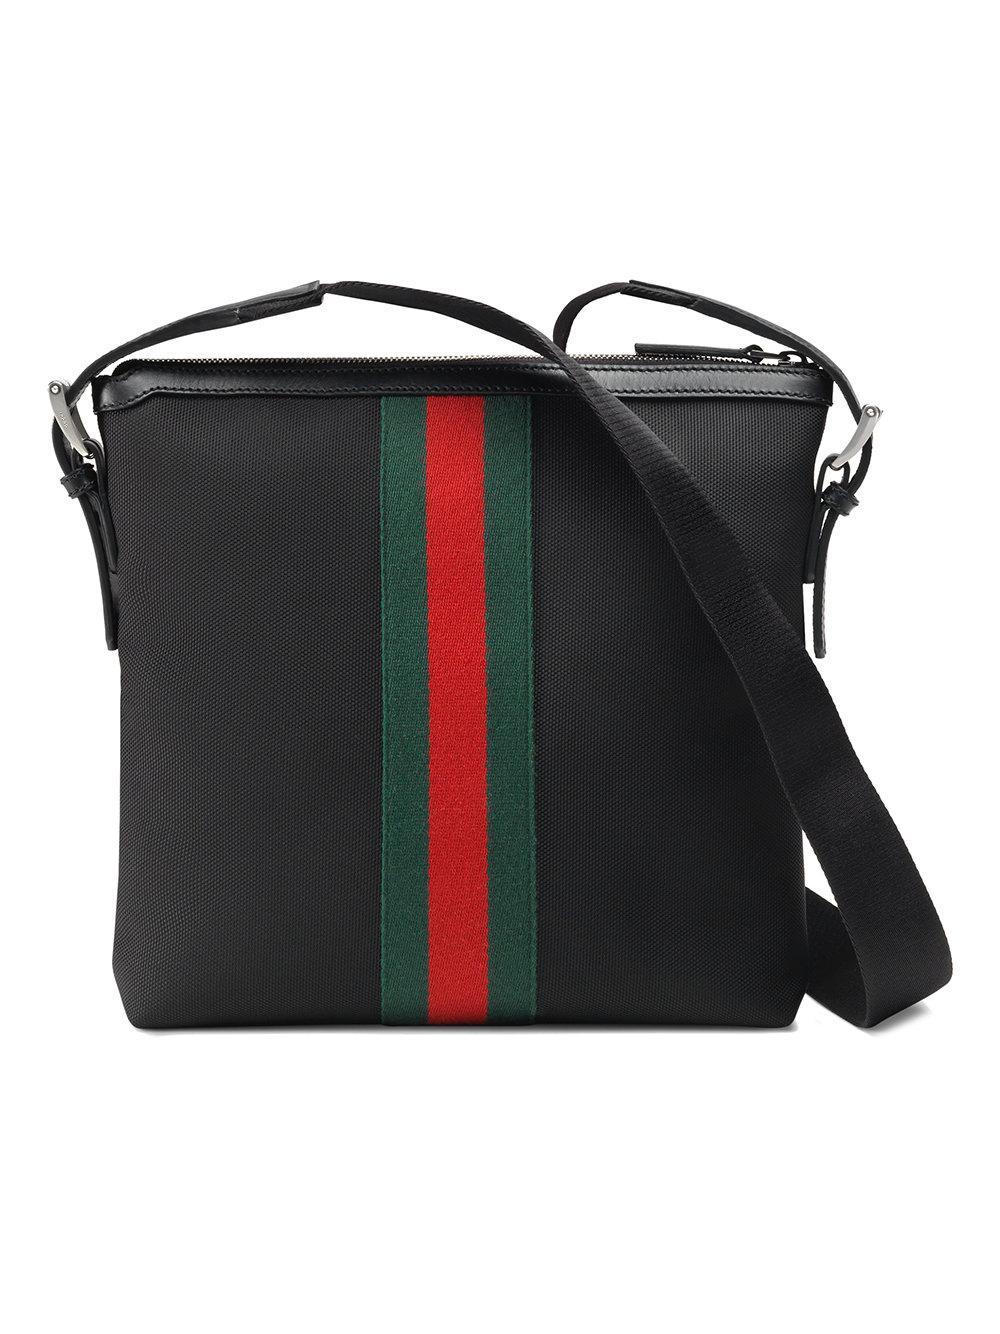 ddbd82ef4534 Gucci Web Techno Canvas Small Messenger Bag Black for Men - Lyst